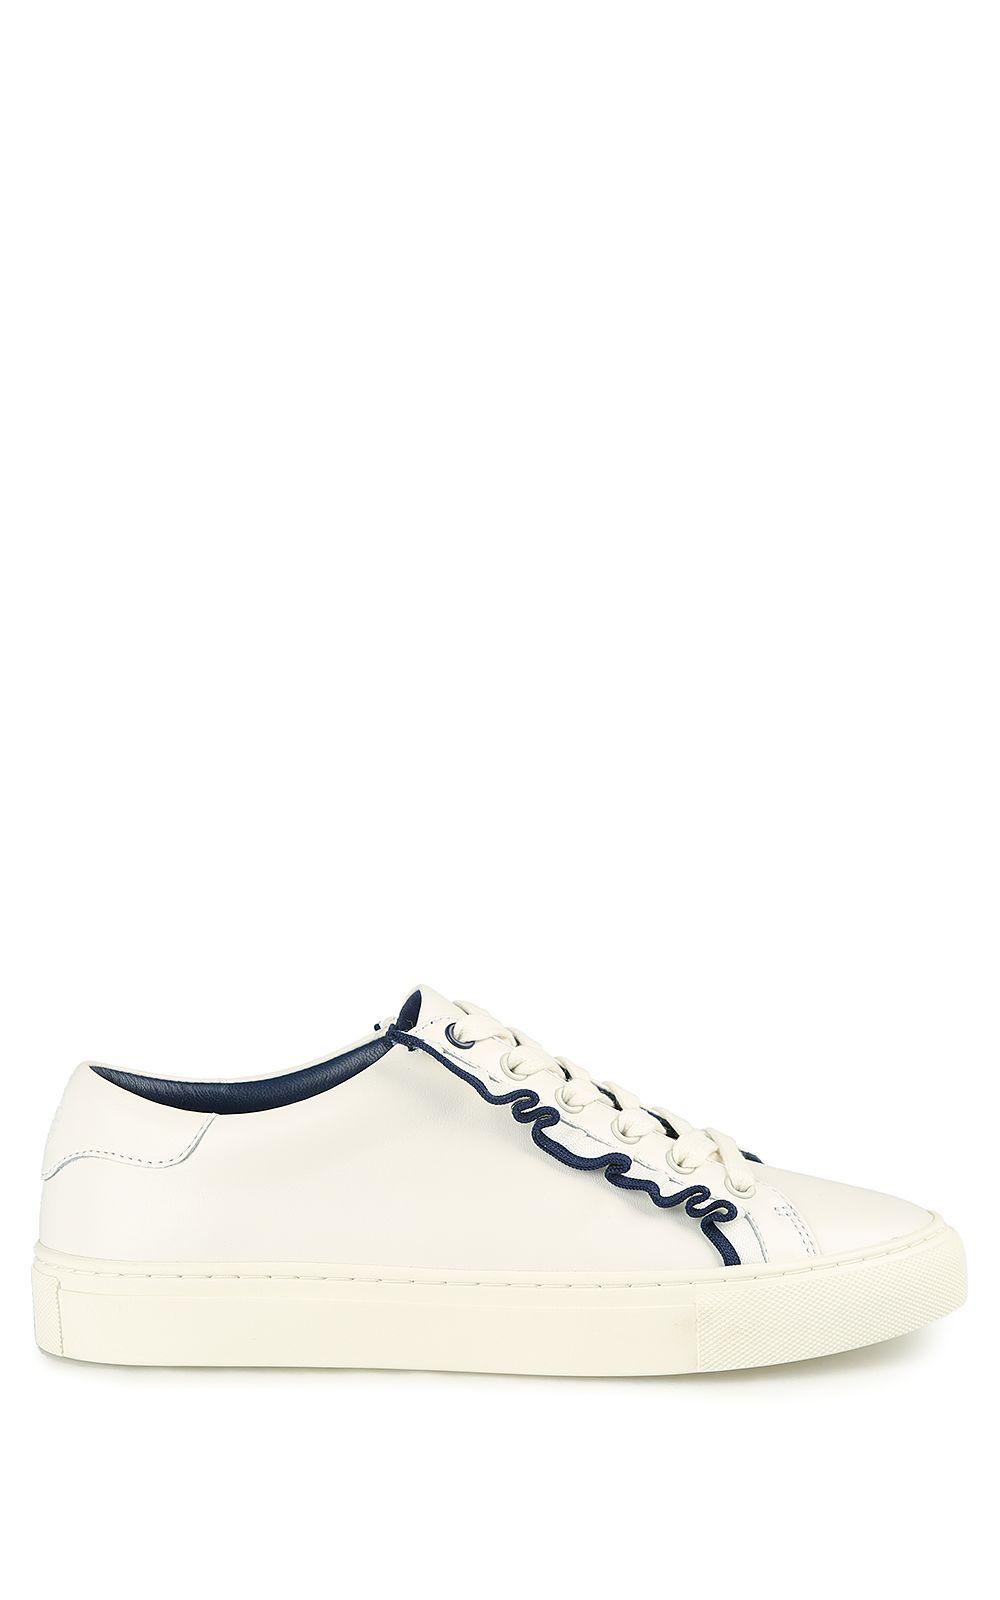 b5230c0b3013 Tory Burch Tory Burch Tory Sport Ruffle-tim Leather Sneakers - White ...